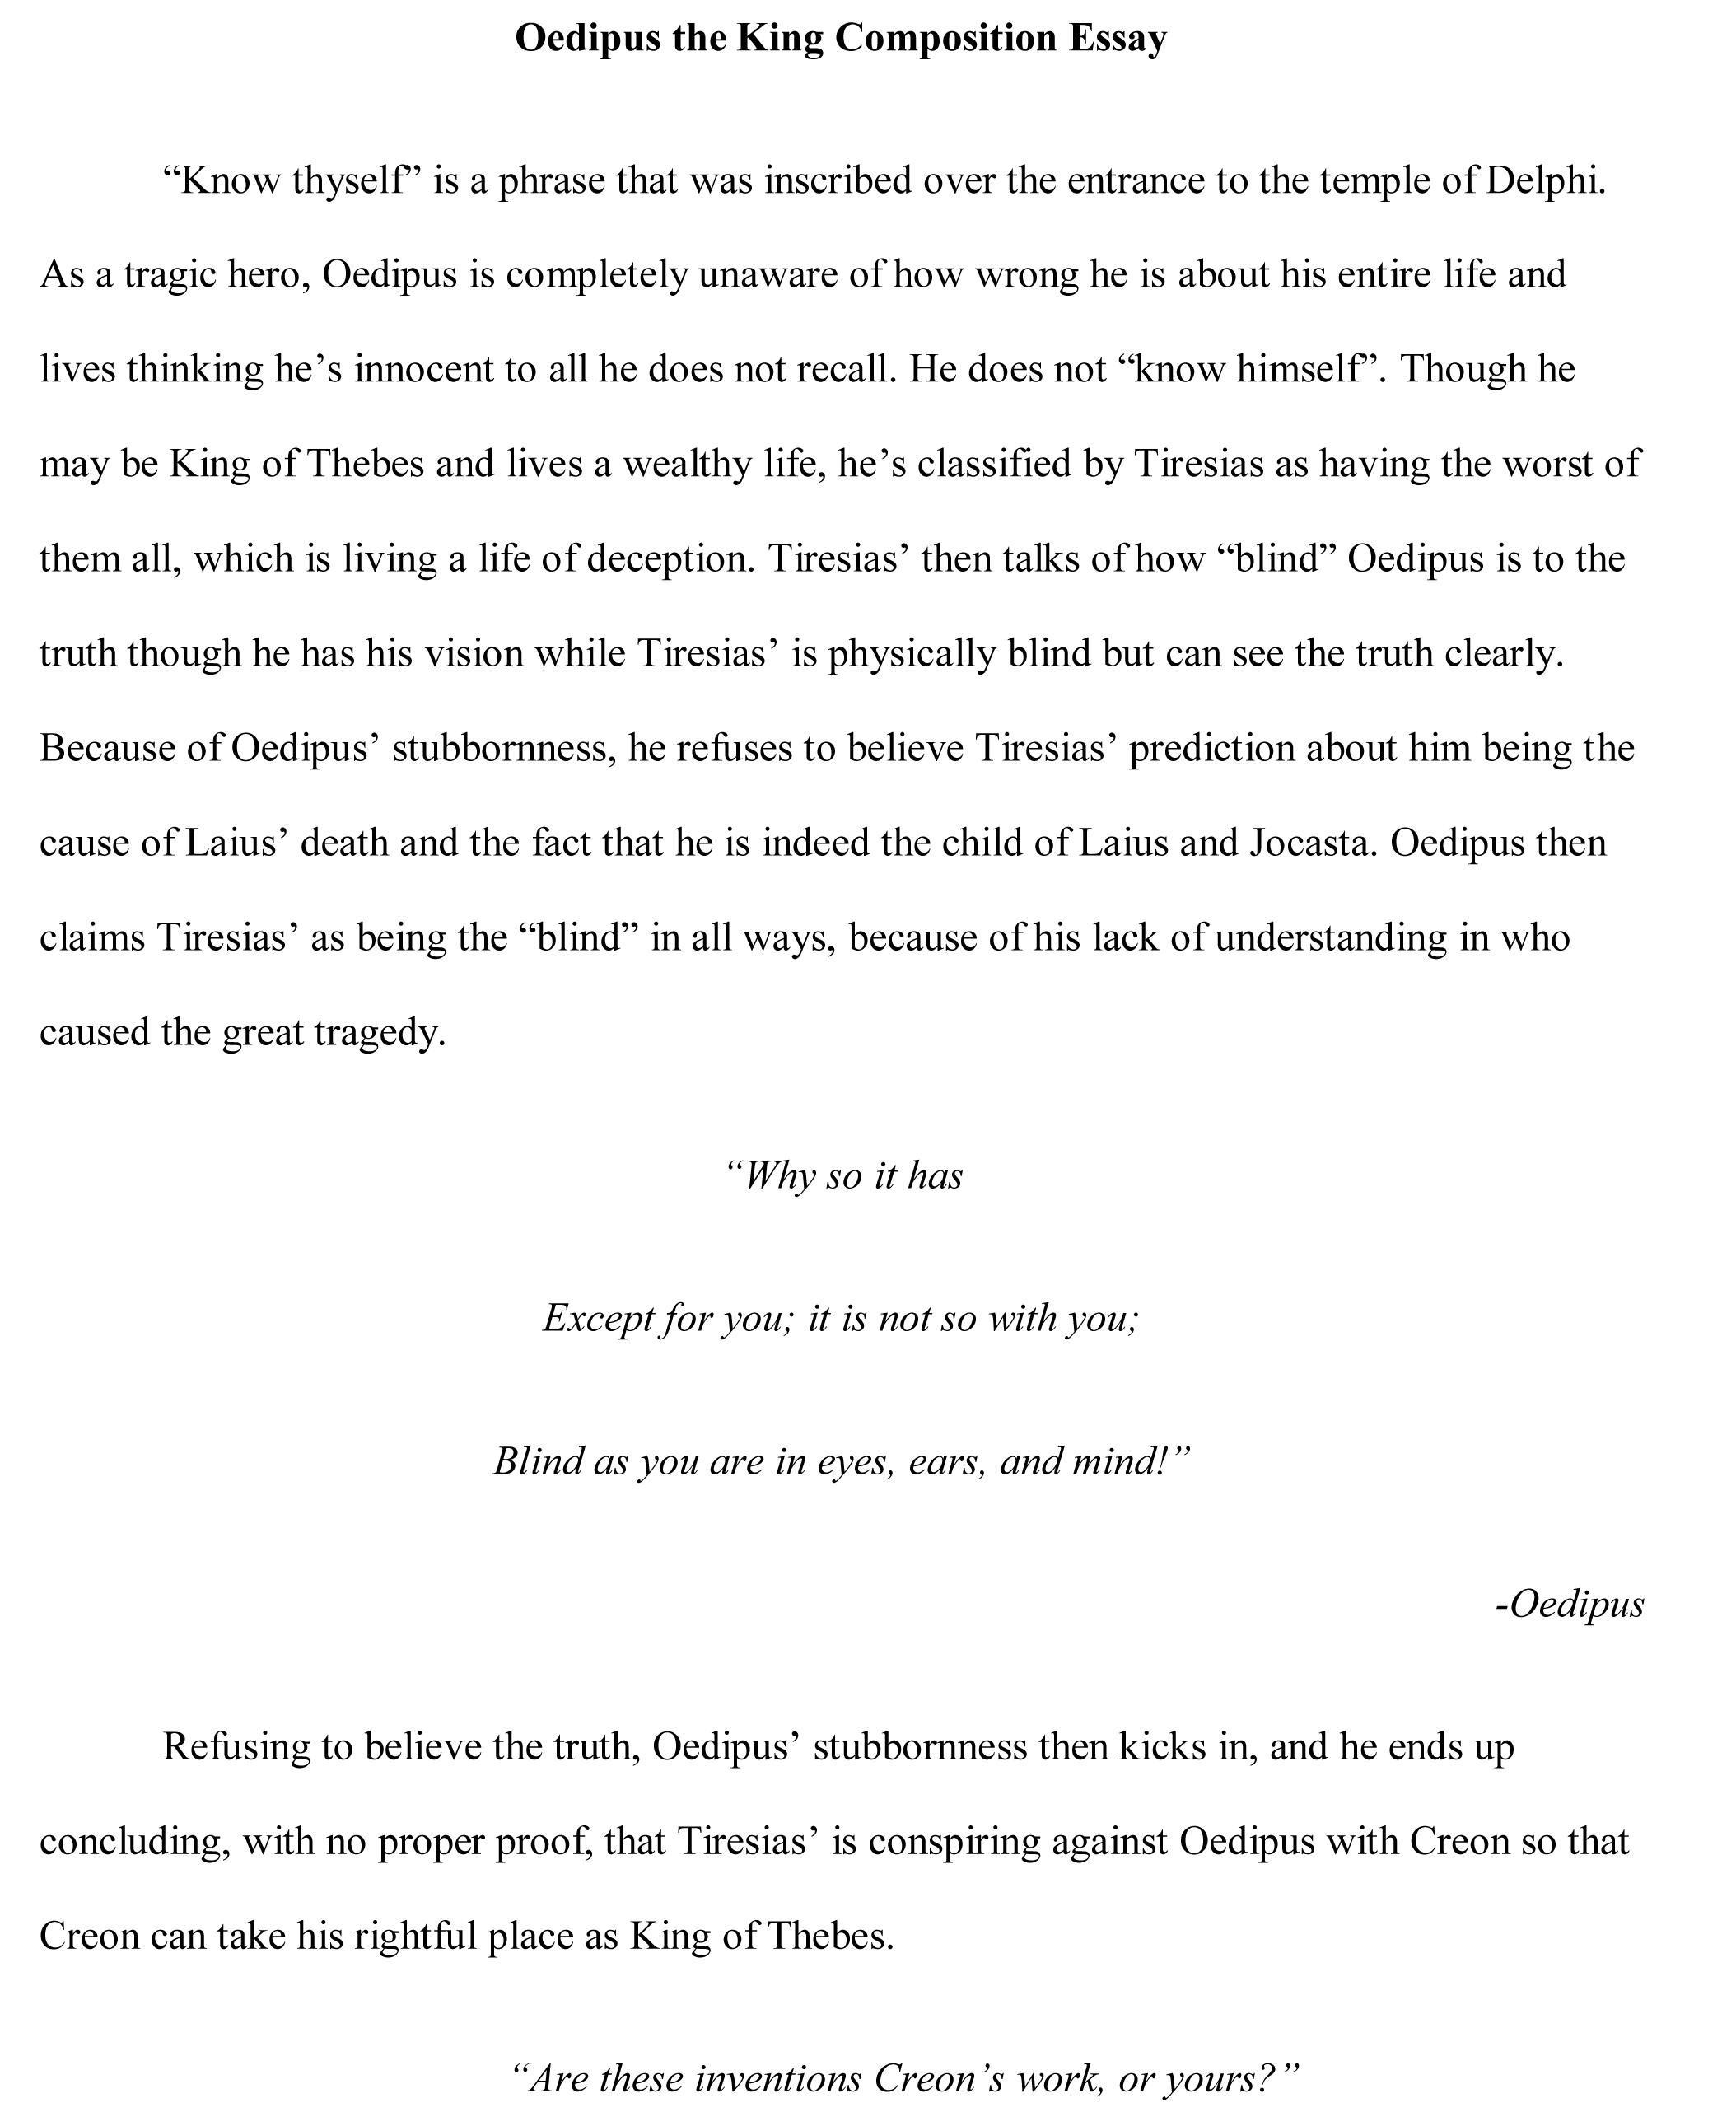 007 Best Essays Oedipus Essay Free Sample Breathtaking 2016 The American Audiobook Short Pdf Full